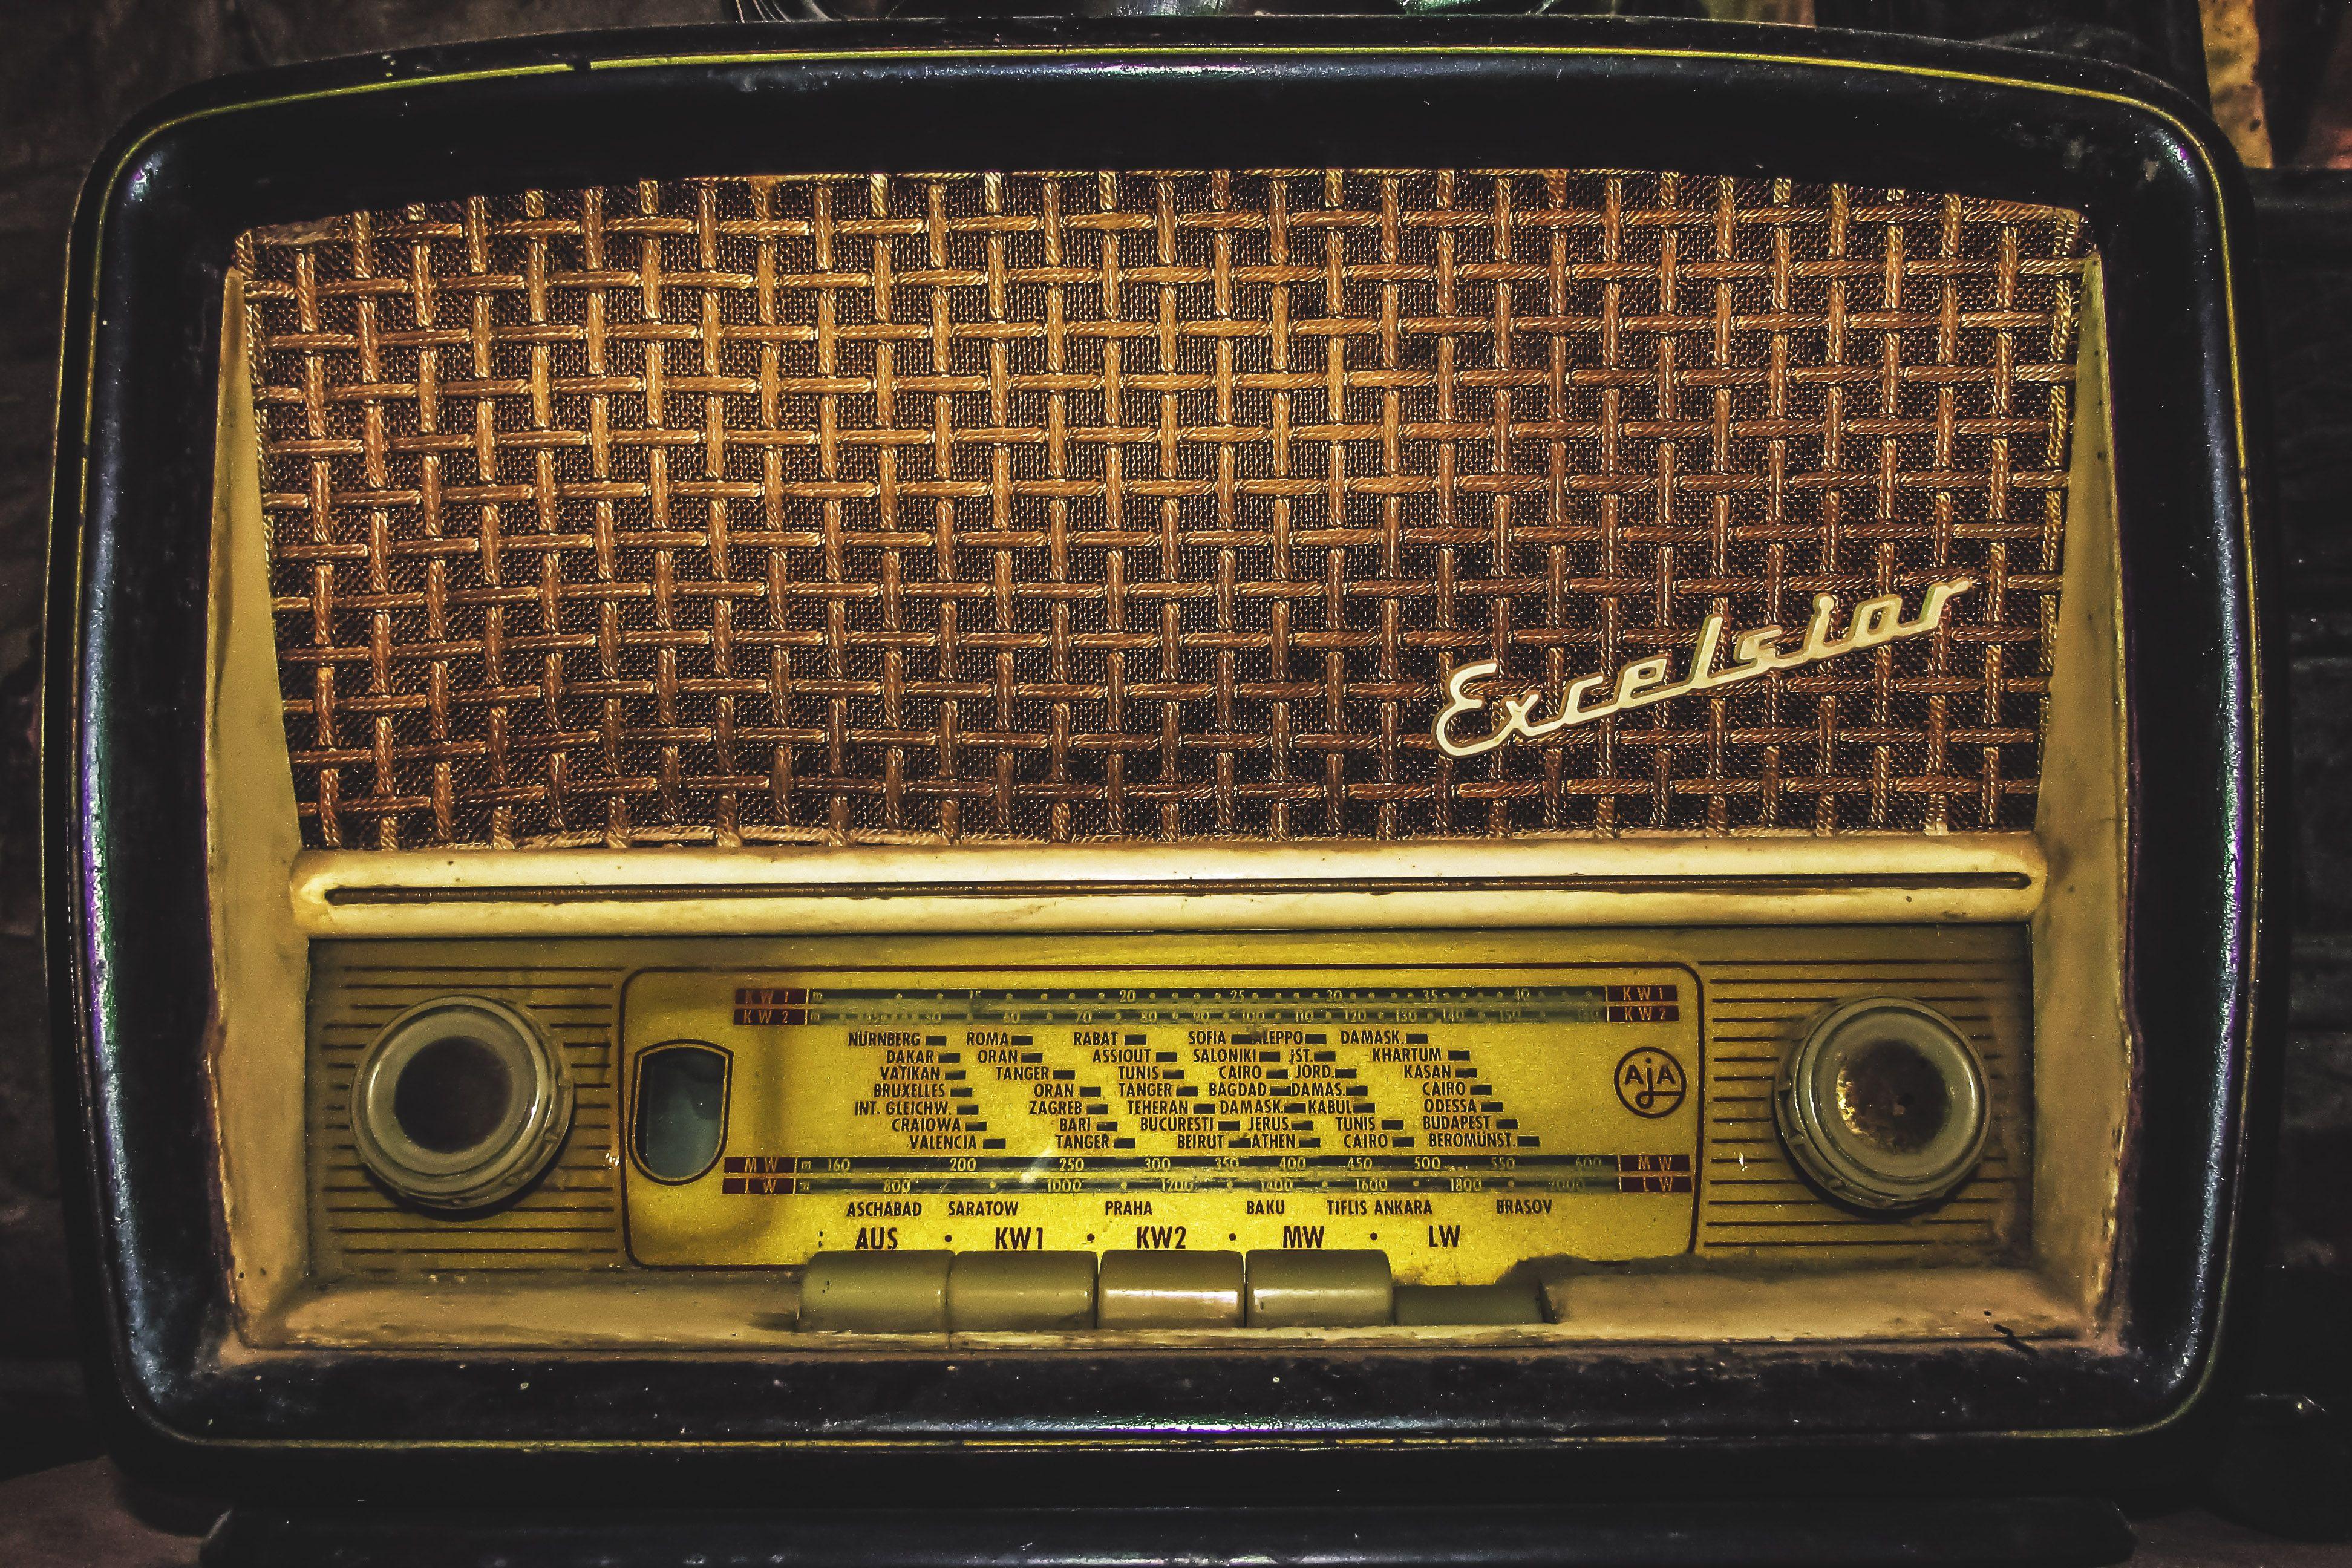 Vintage Wallpaper Radio Vintage Wallpaper Vintage Radio Wallpapers Vintage